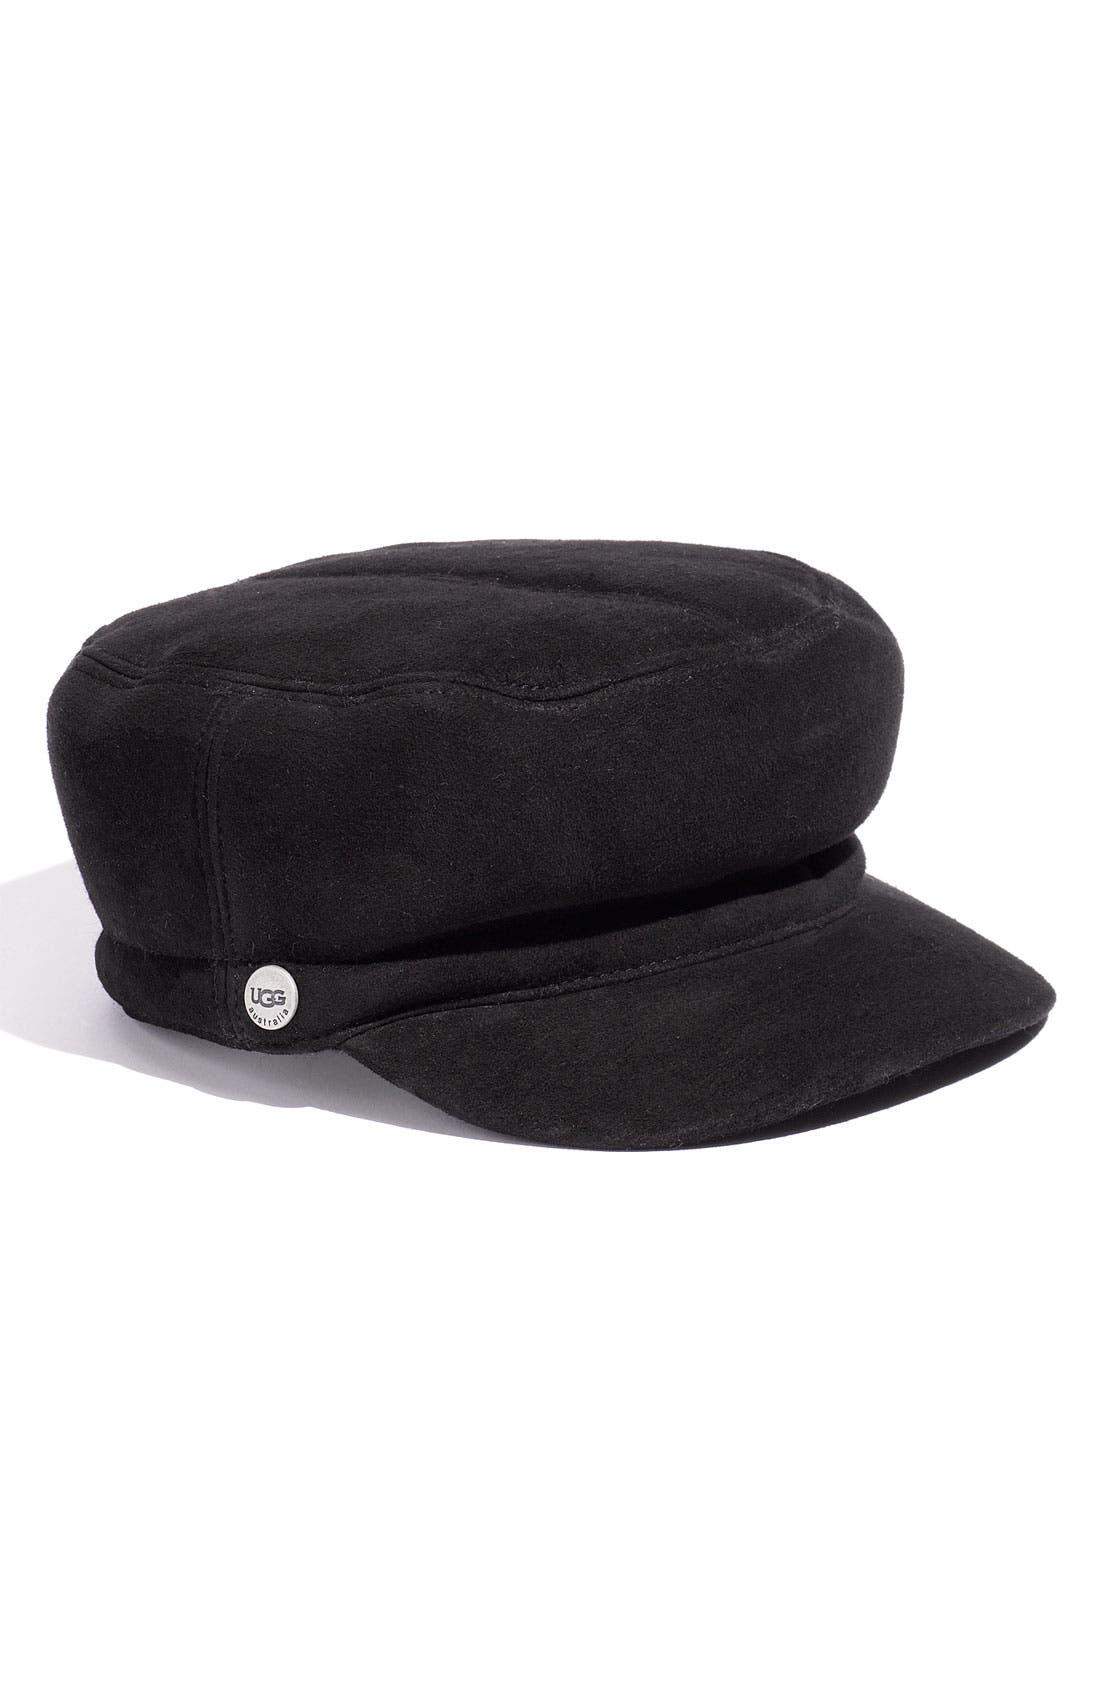 Main Image - UGG® Australia 'Classic' Shearling  Cap